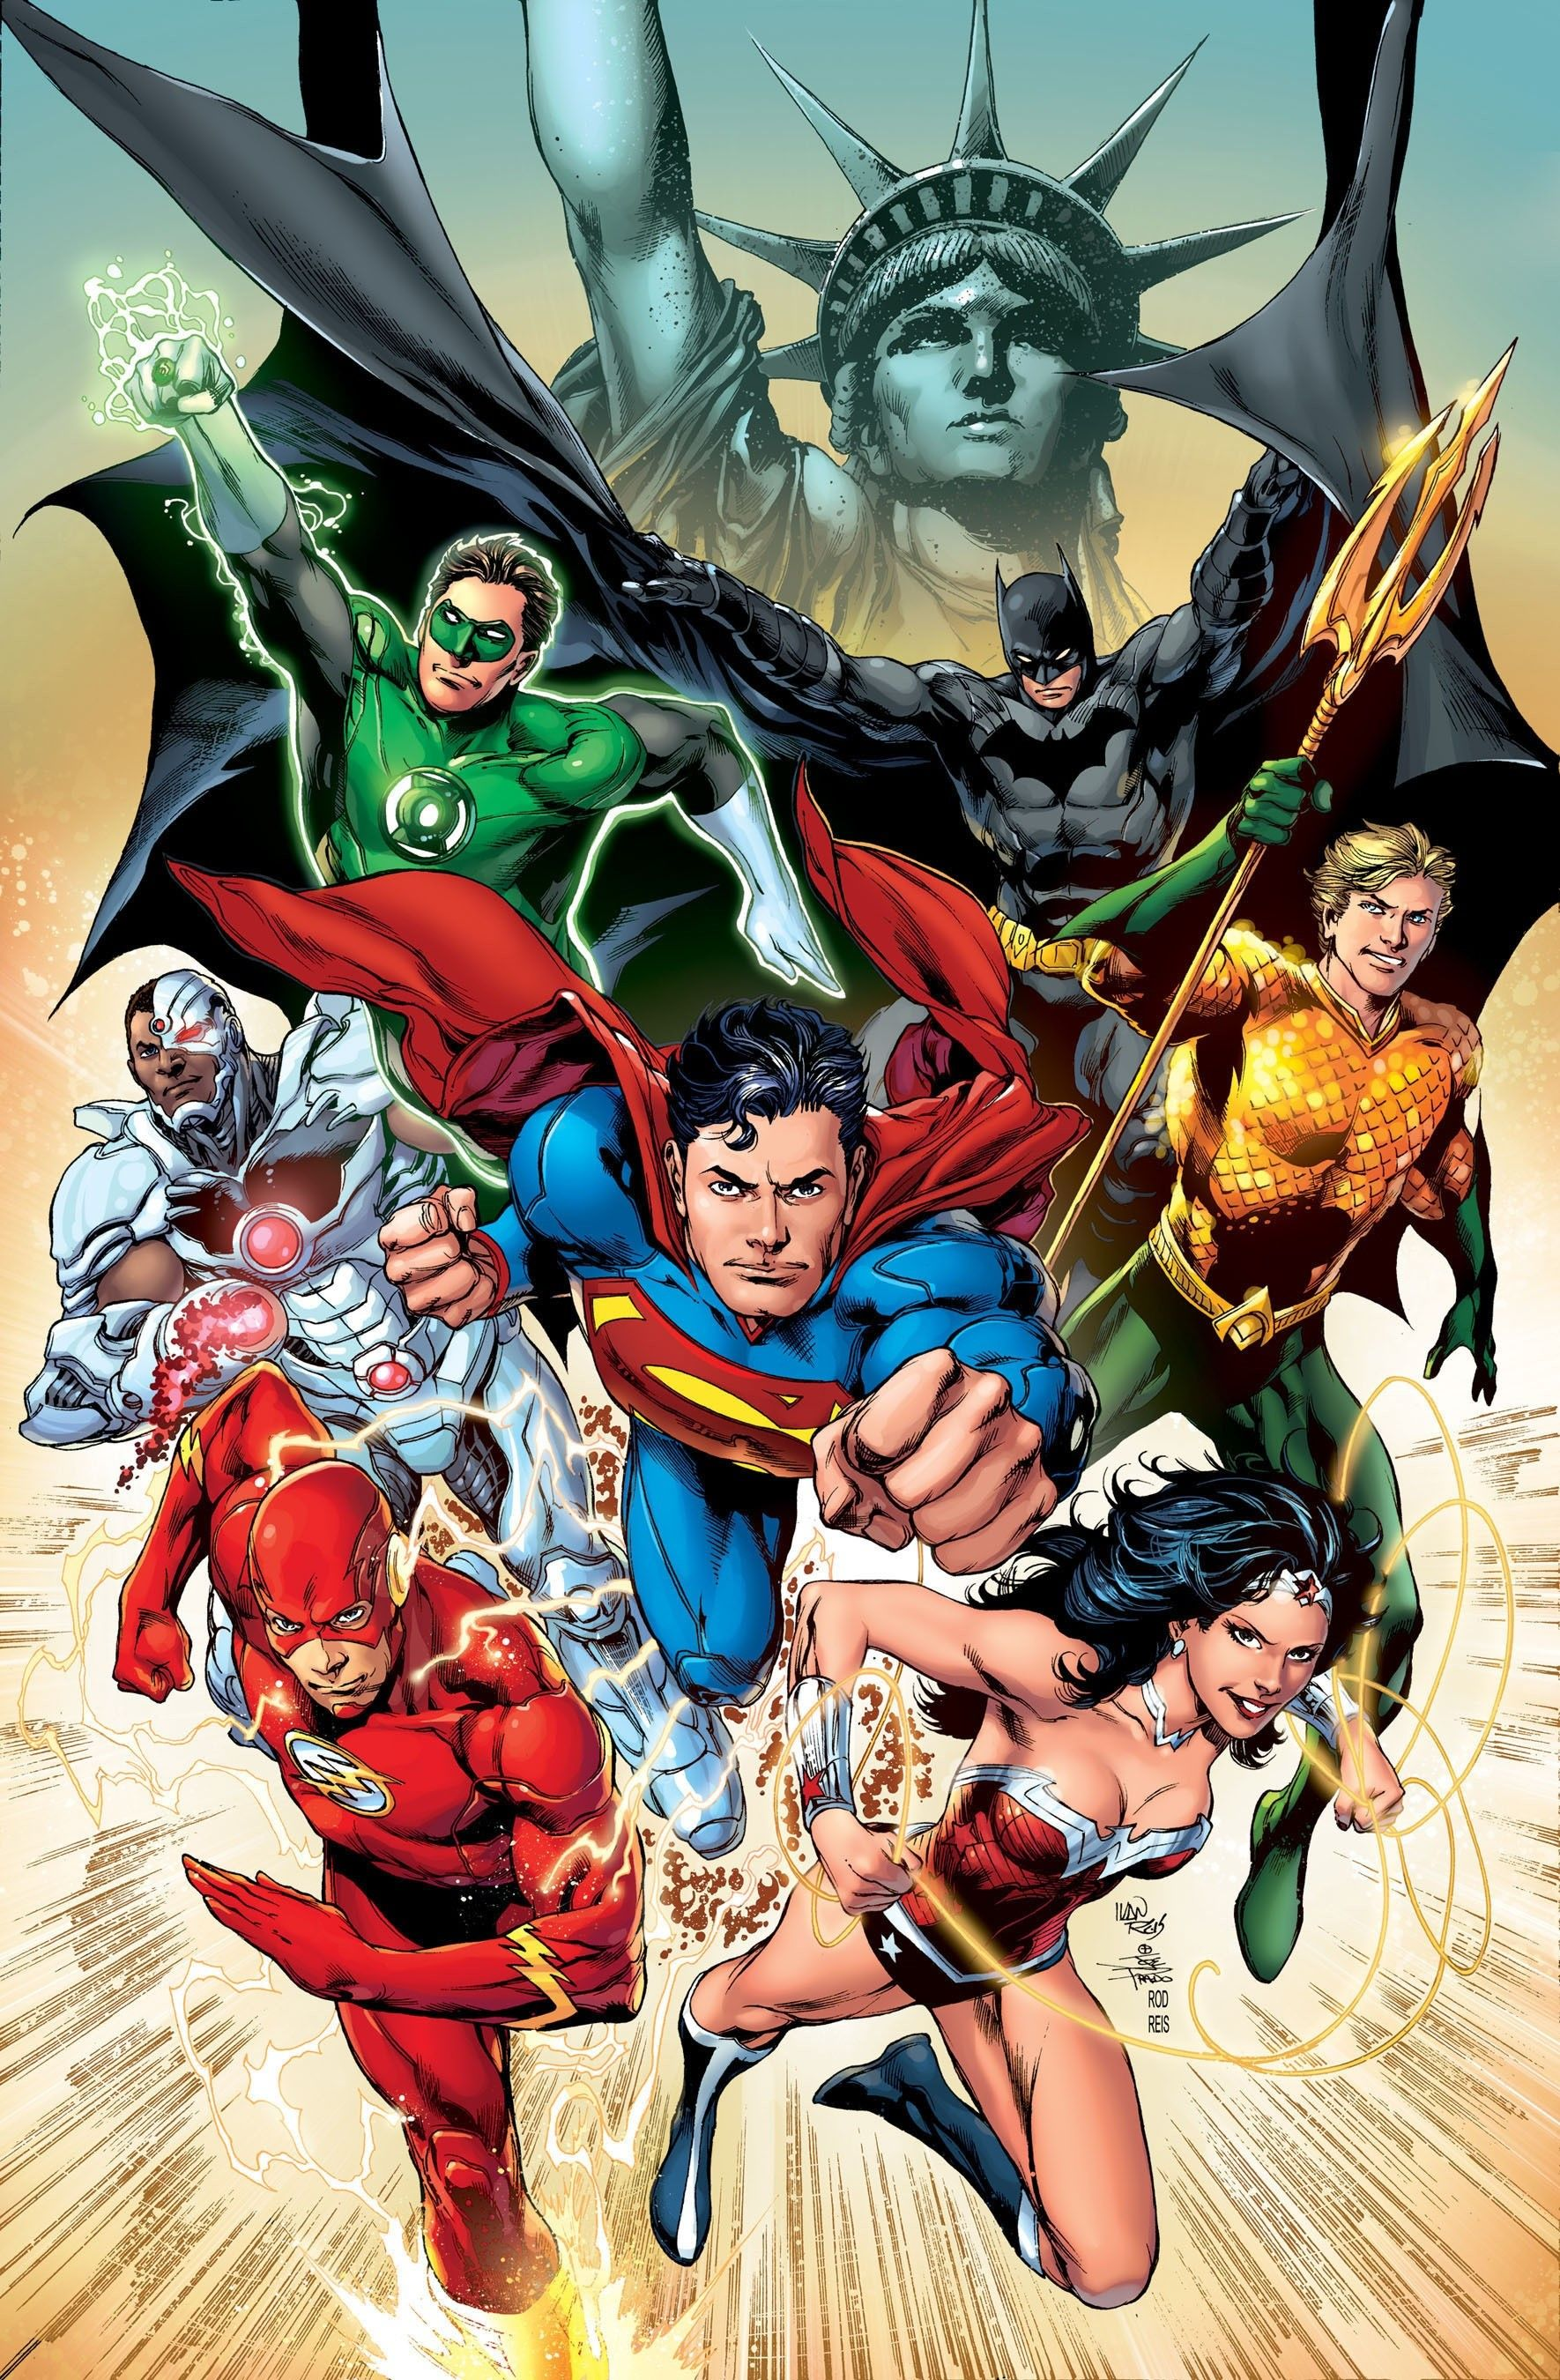 Justice League Of America Fan Art Justice League By Jim Lee Scott Williams Alex Sinclair Justice League Superheroes Justice League New 52 Comics